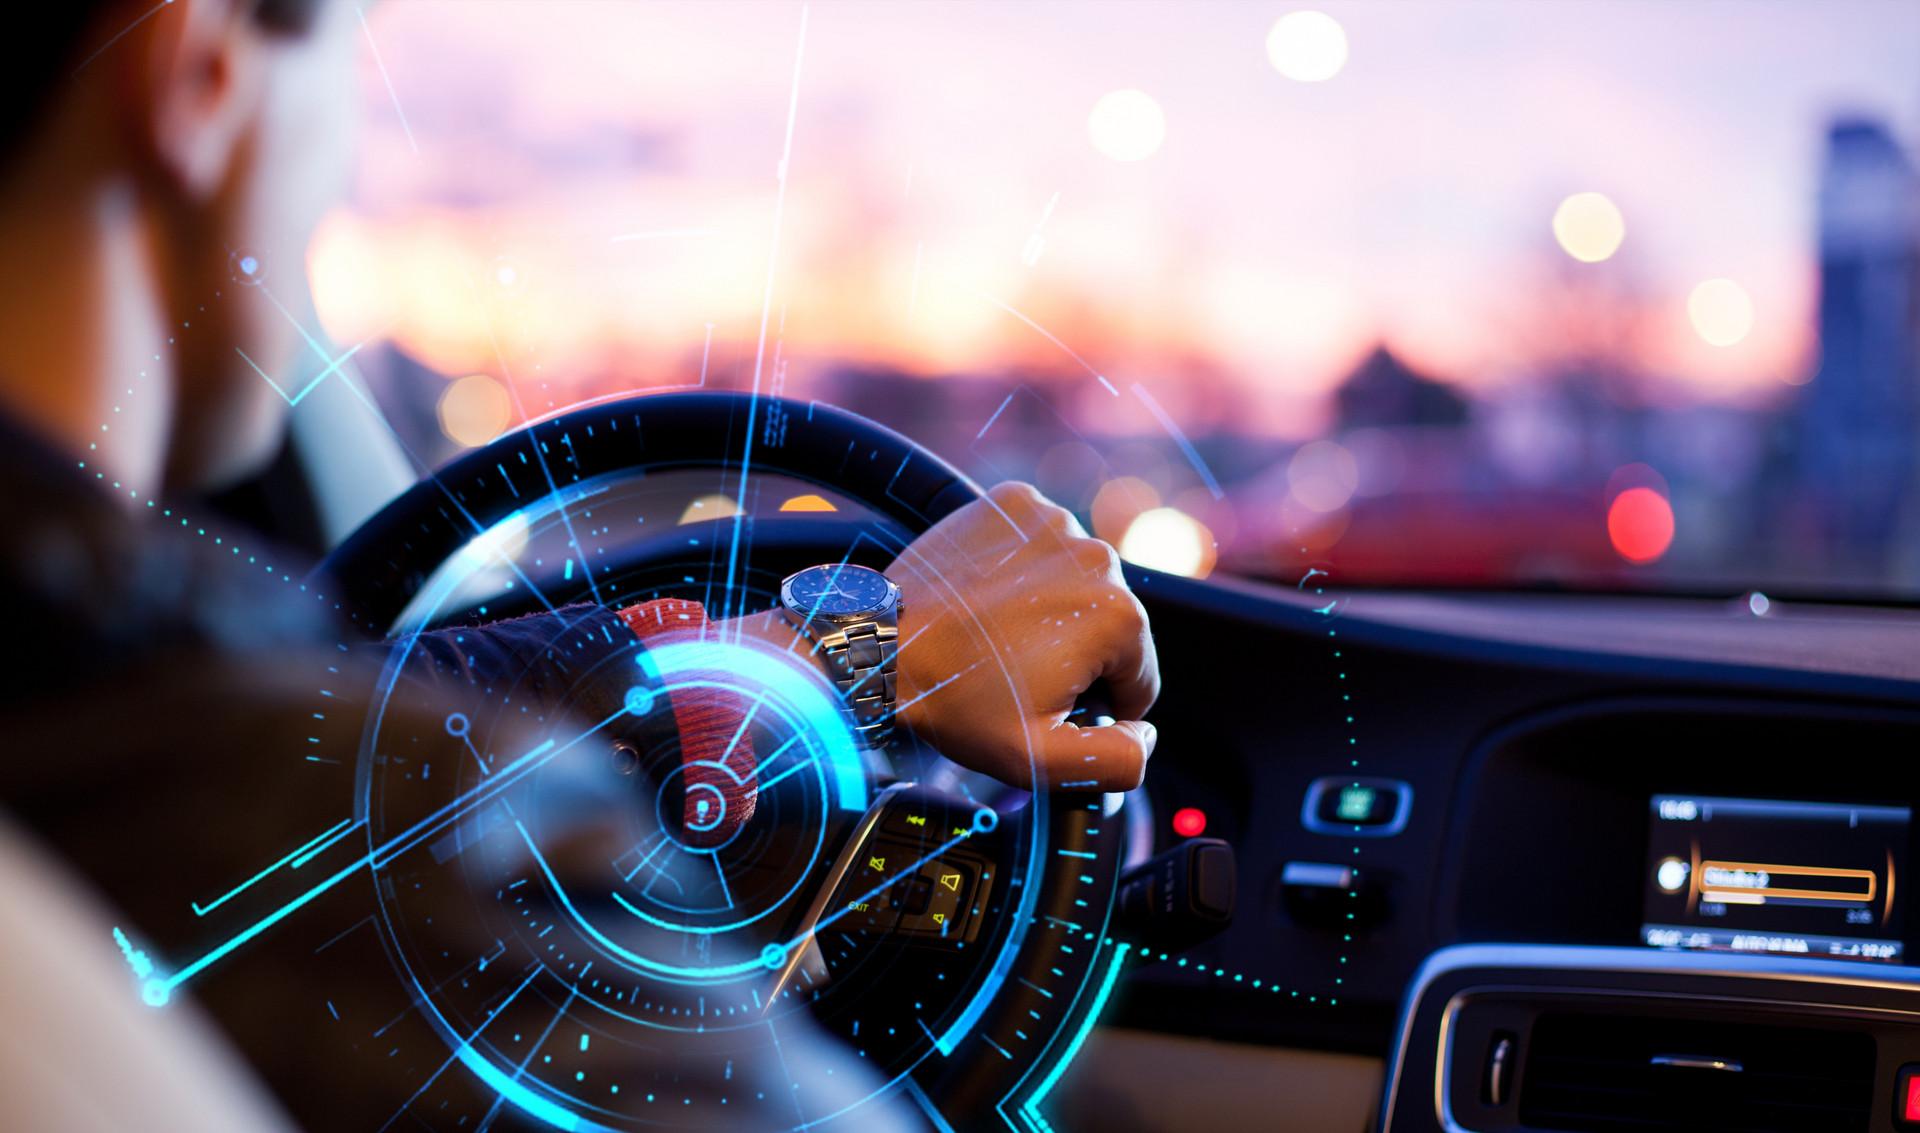 chinamoneynetwork.com - China Money AI - Intelligent Auto System Company Joy Next Raises RMB720 Million